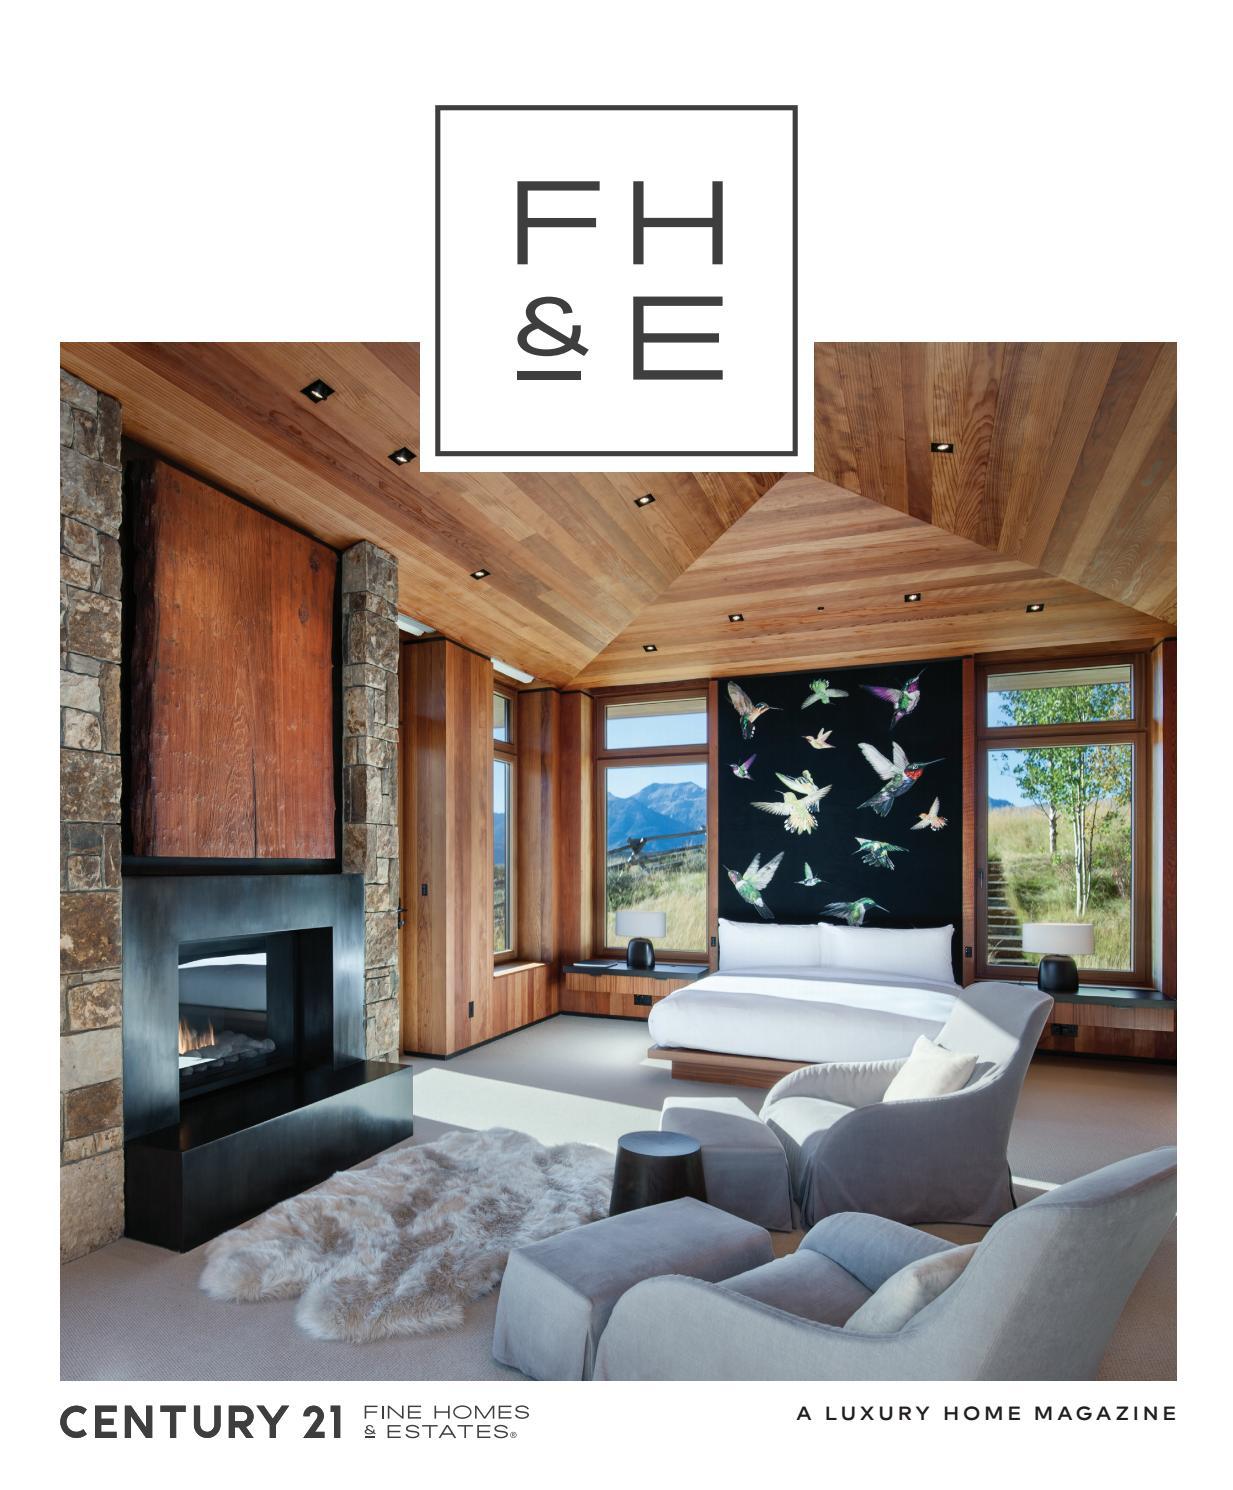 2020 Century 21 Fine Homes Estates Luxury Home Magazine Issue No 10 By Century 21 Real Estate Issuu